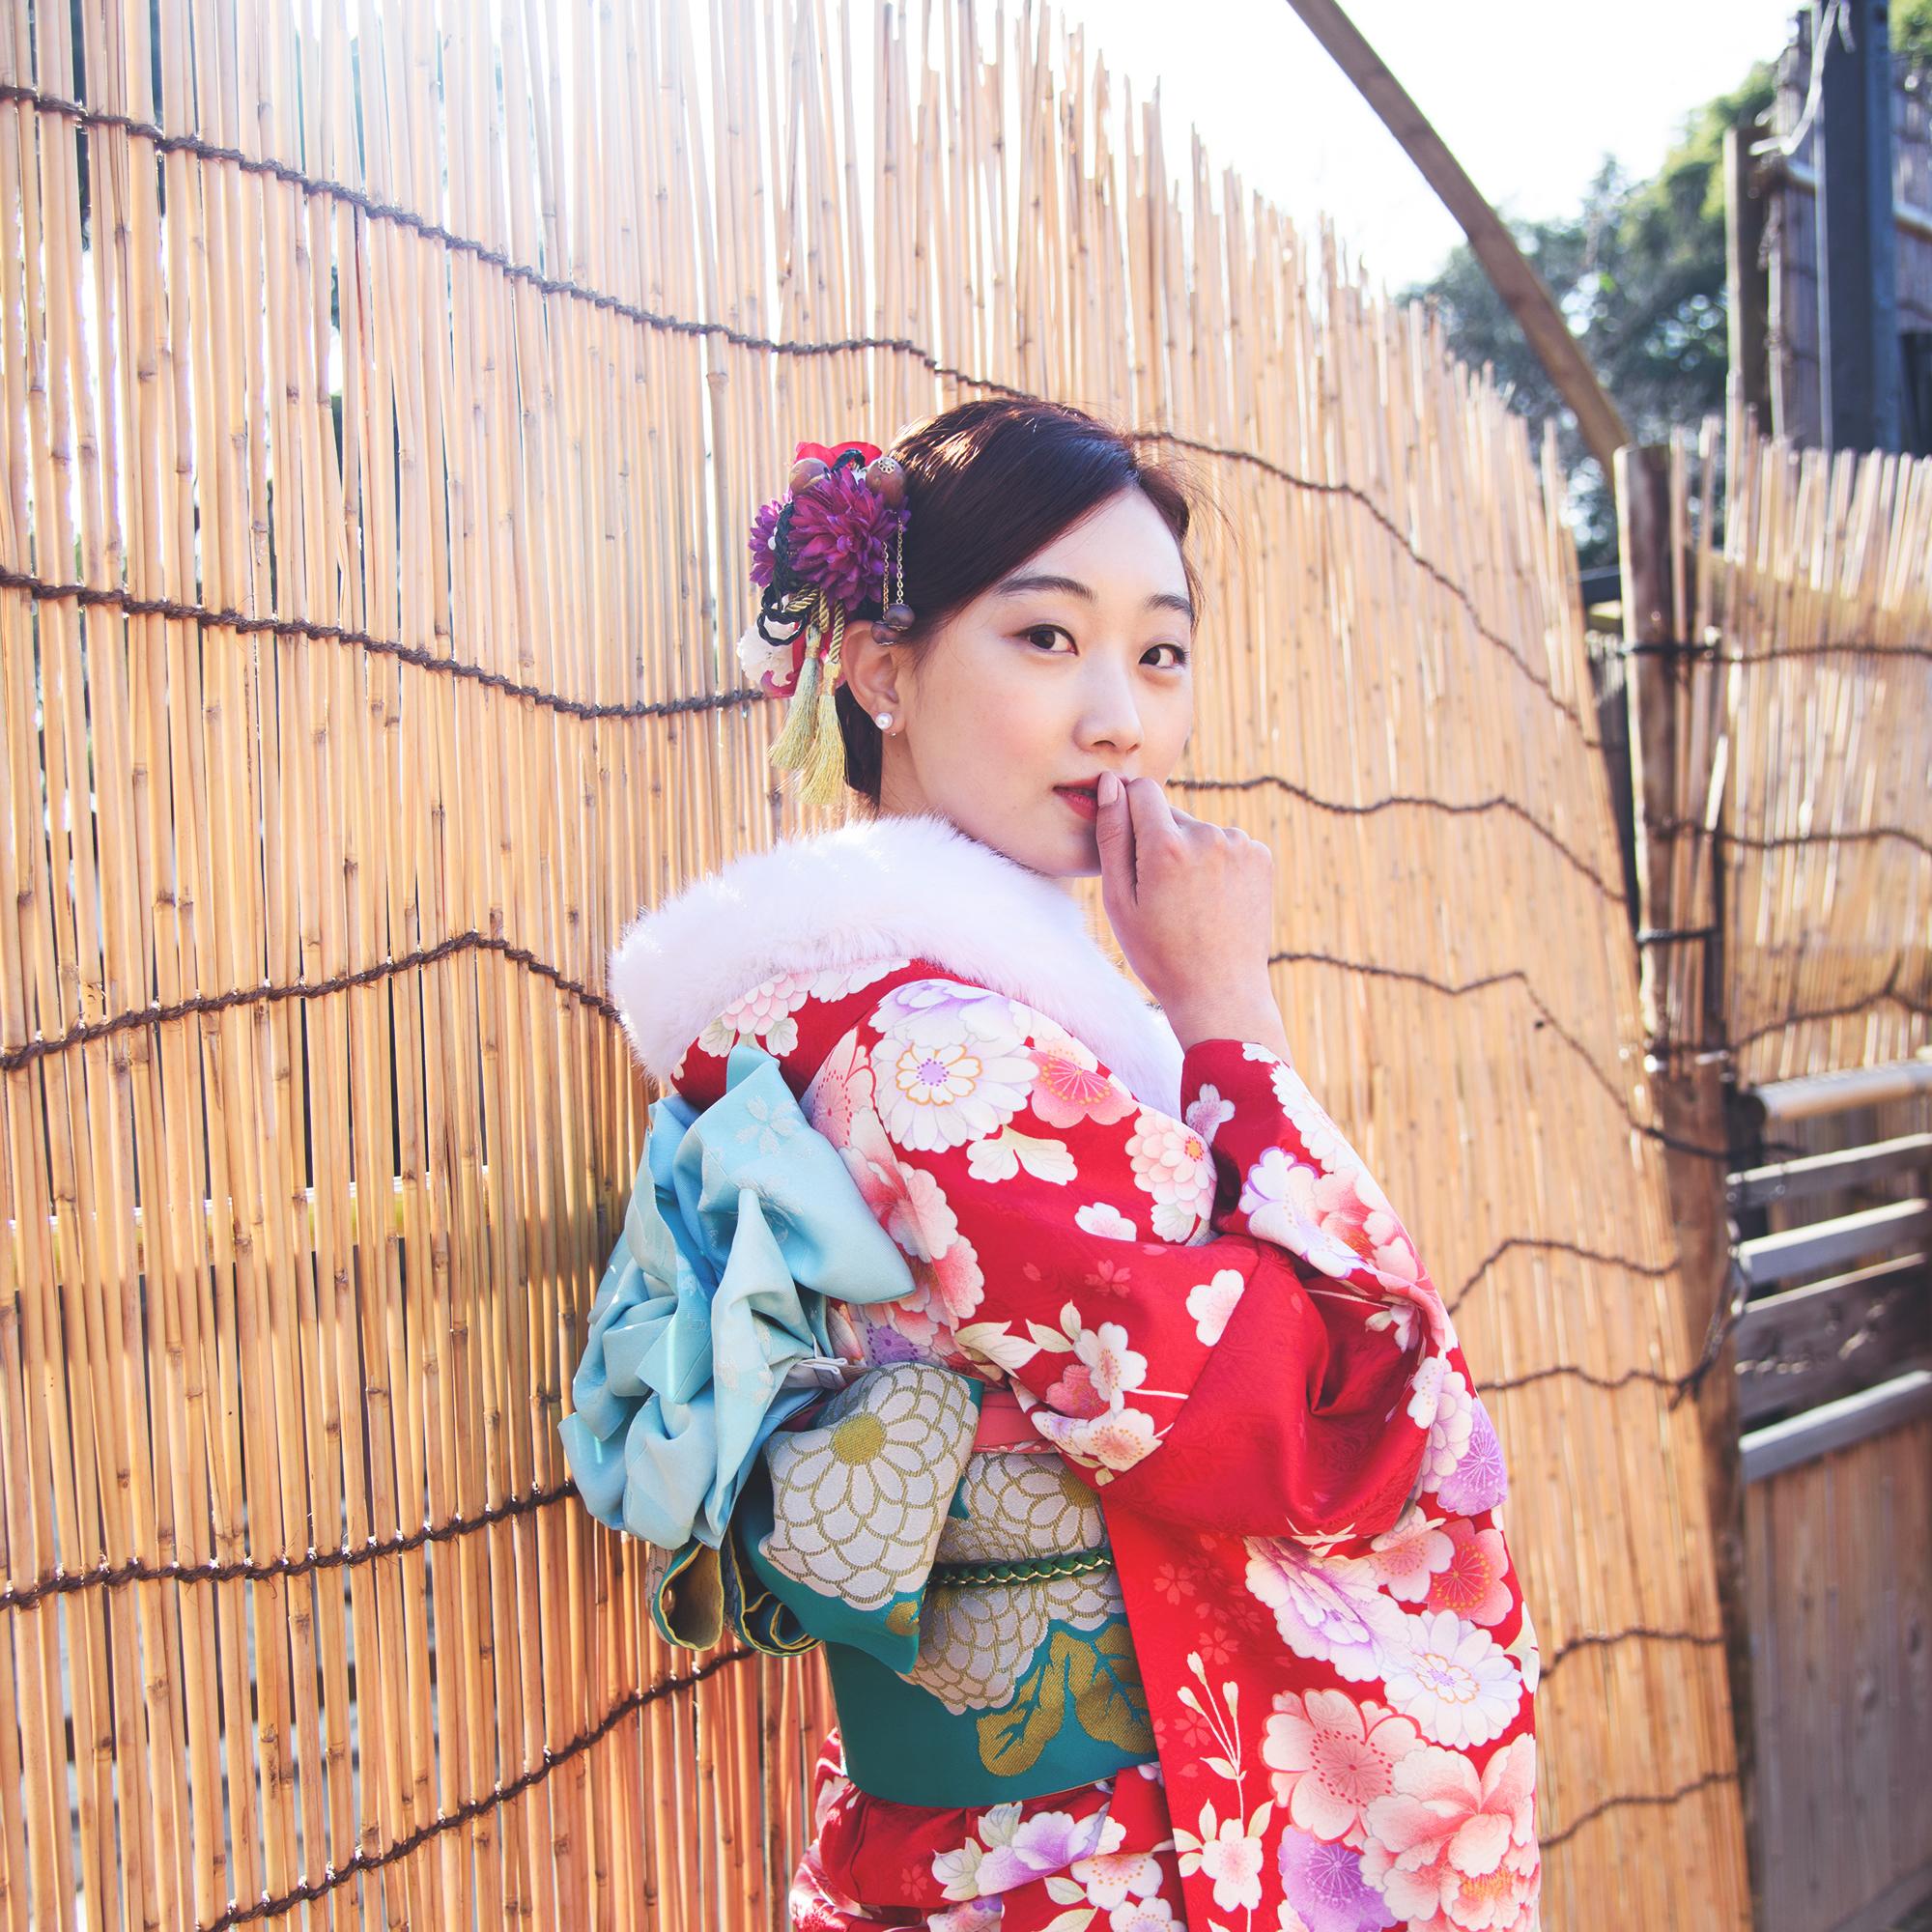 Sprazzi_Professional_Portrait_Photo_Tokyo_Osun_16.jpg